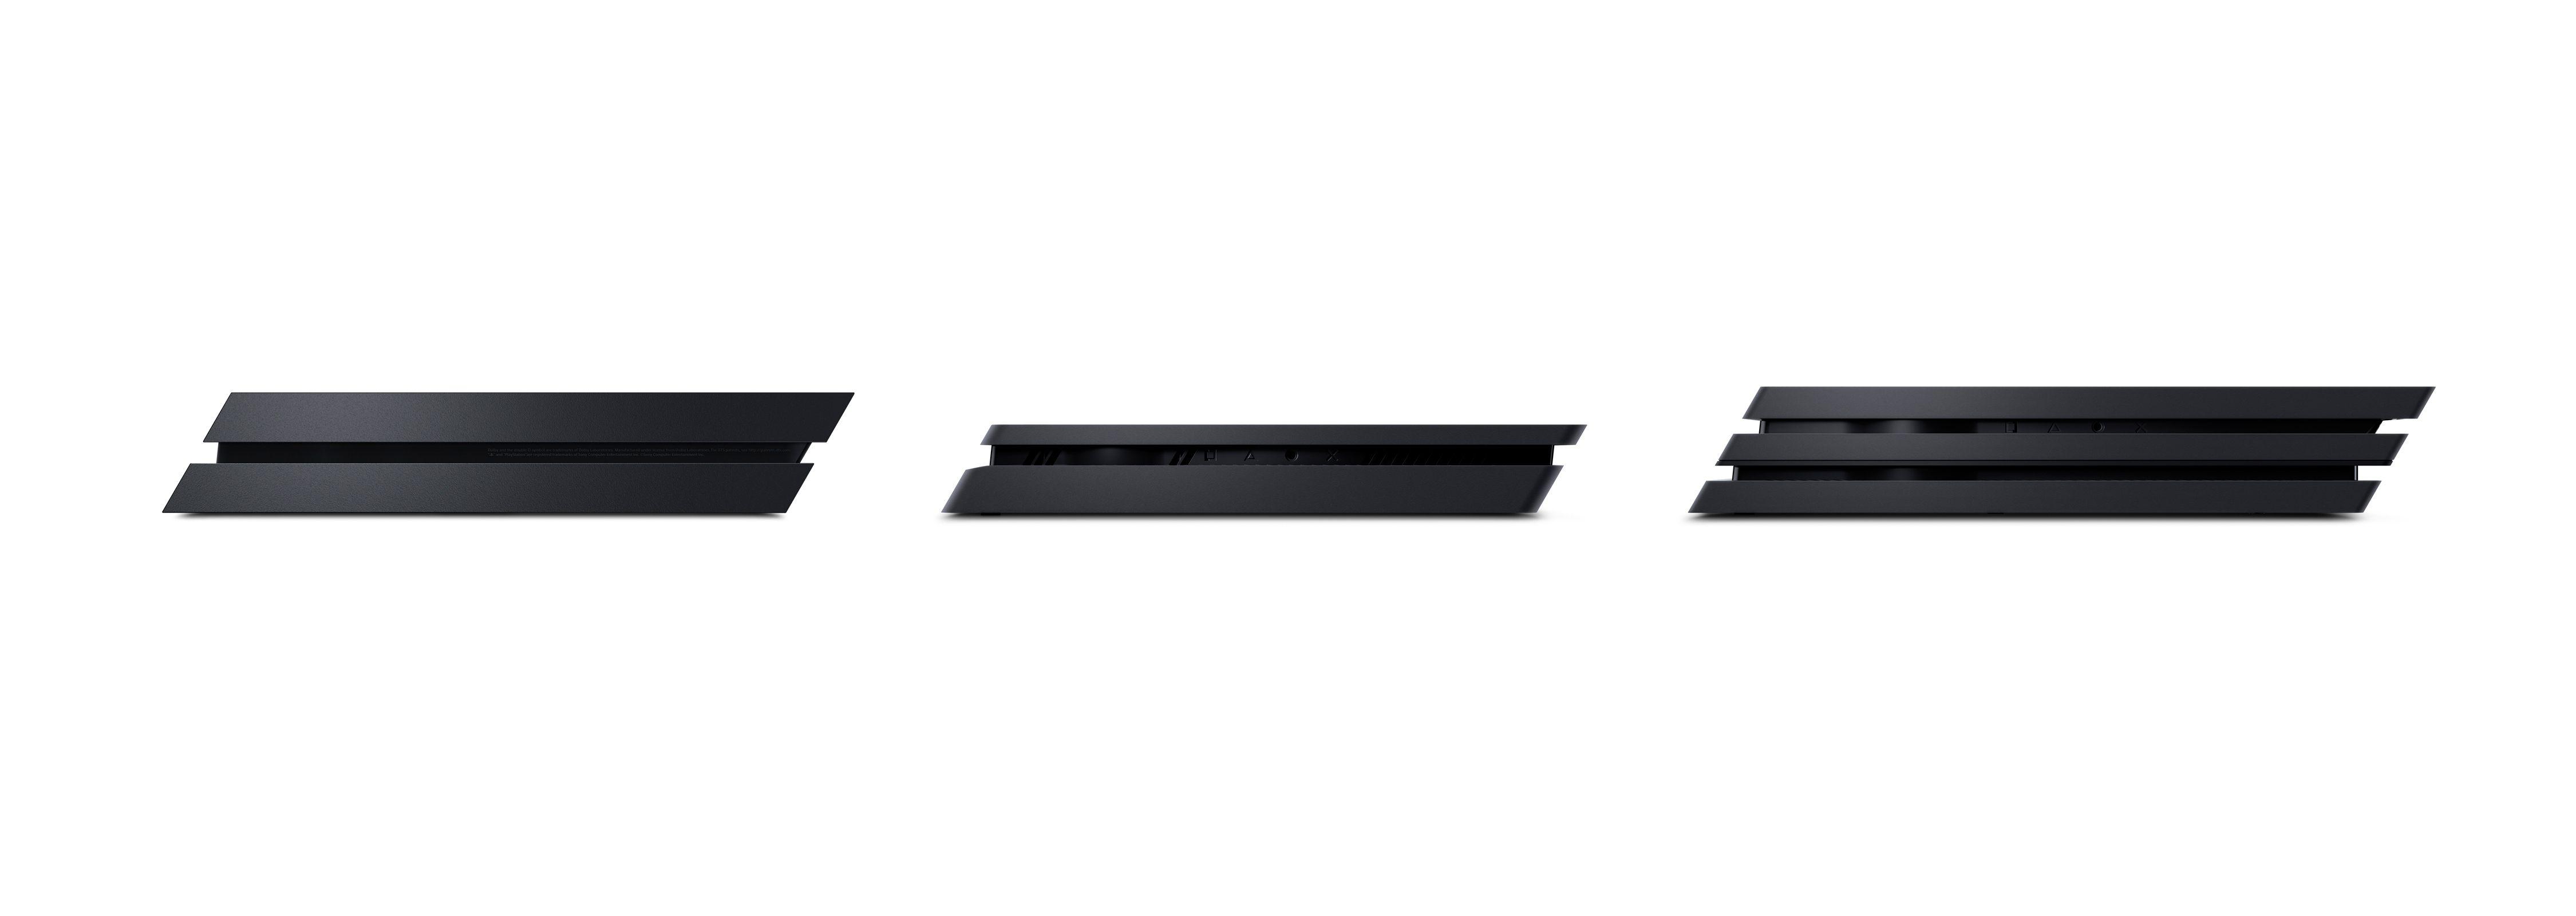 PlayStation 4 PS4 Slim Pro